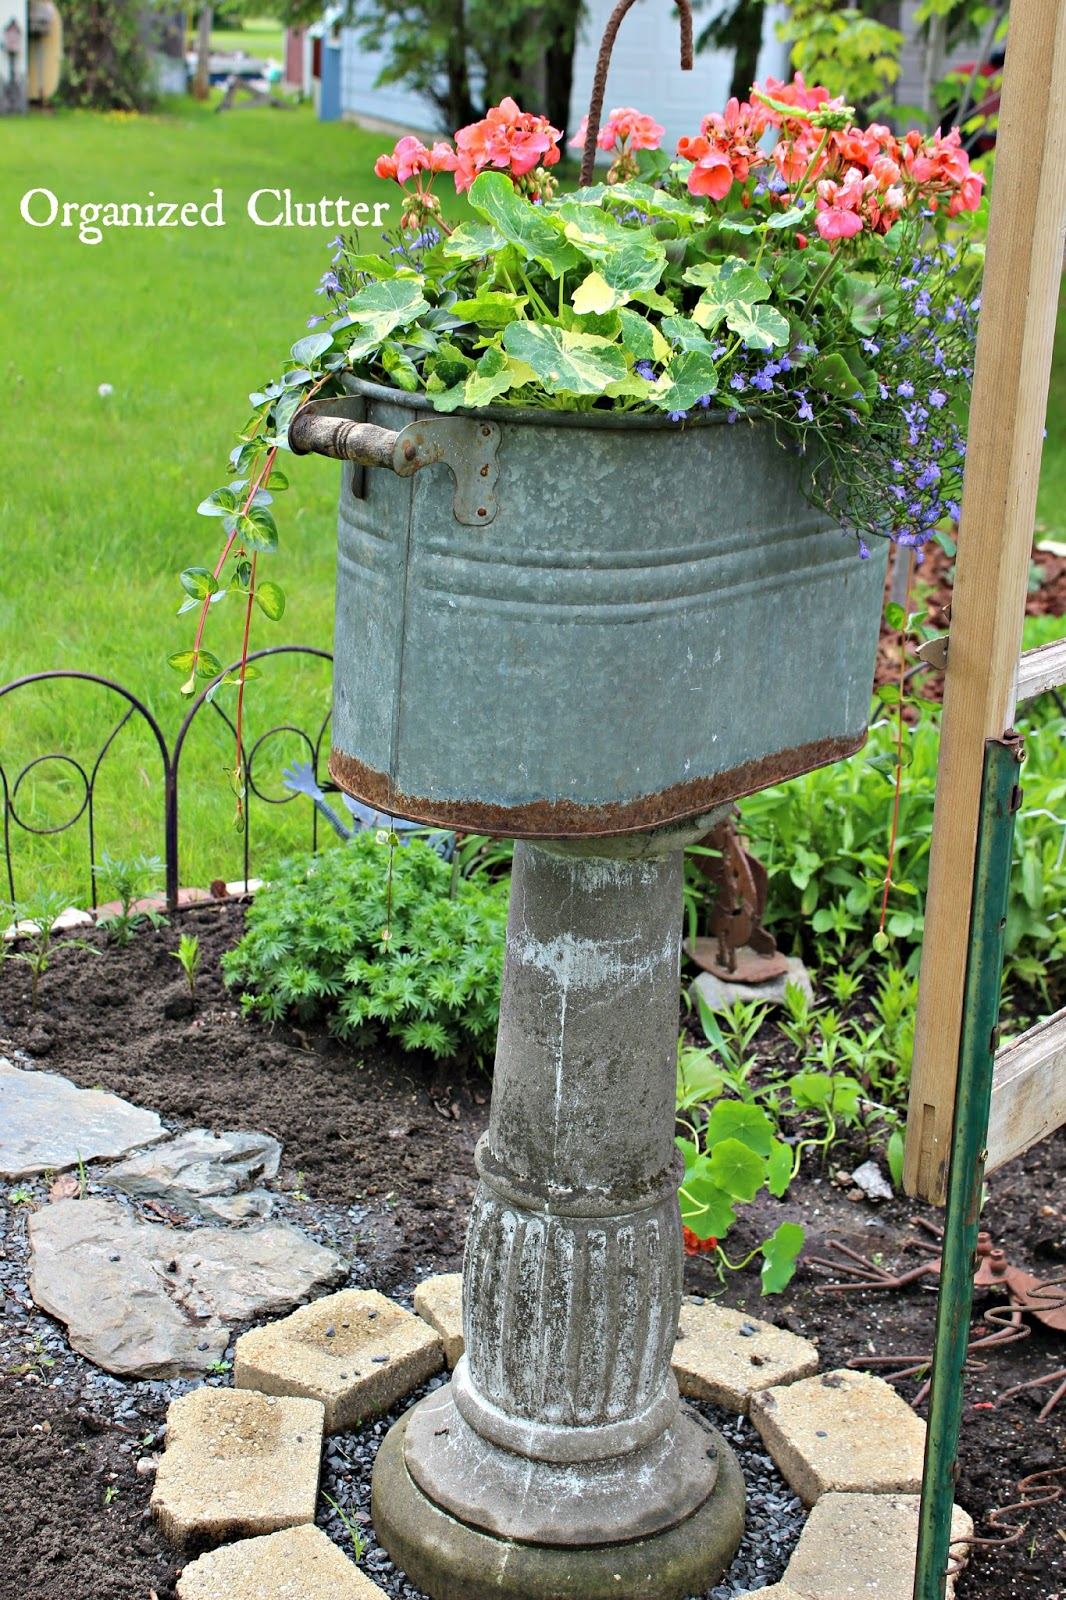 How To Add Vertical Interest to the Flower Garden   Organized Clutter